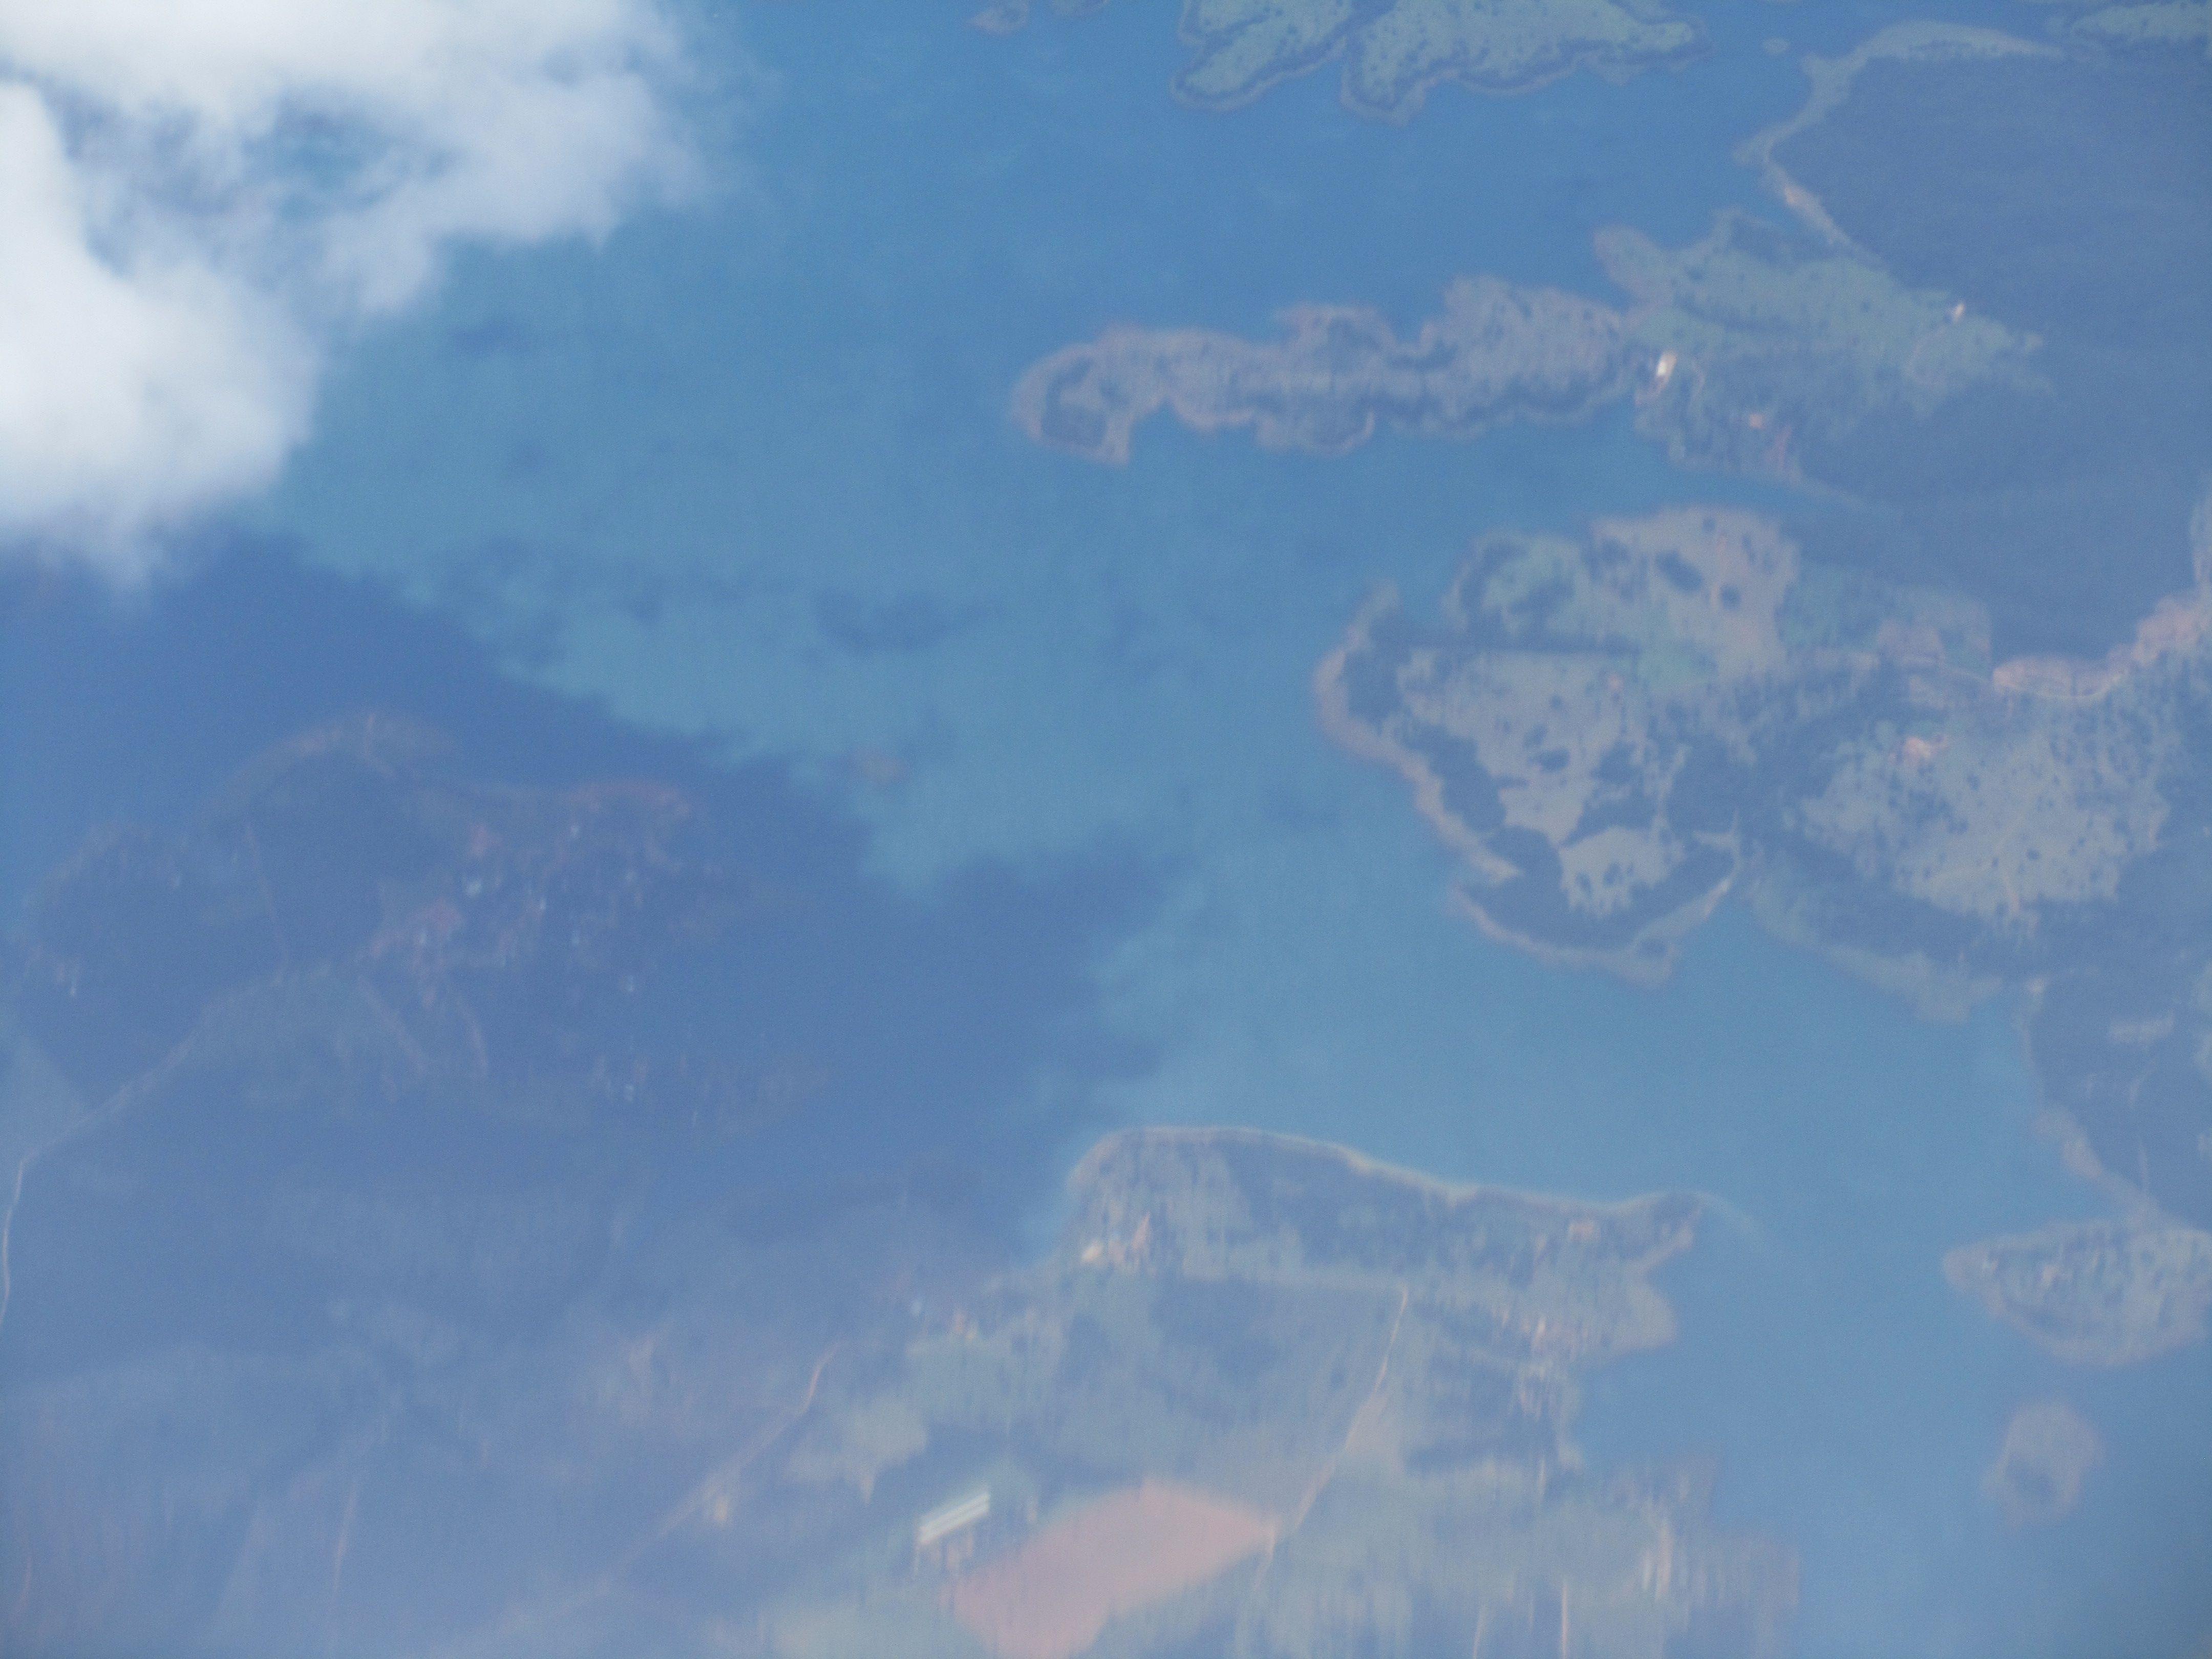 ilha de comandatuba